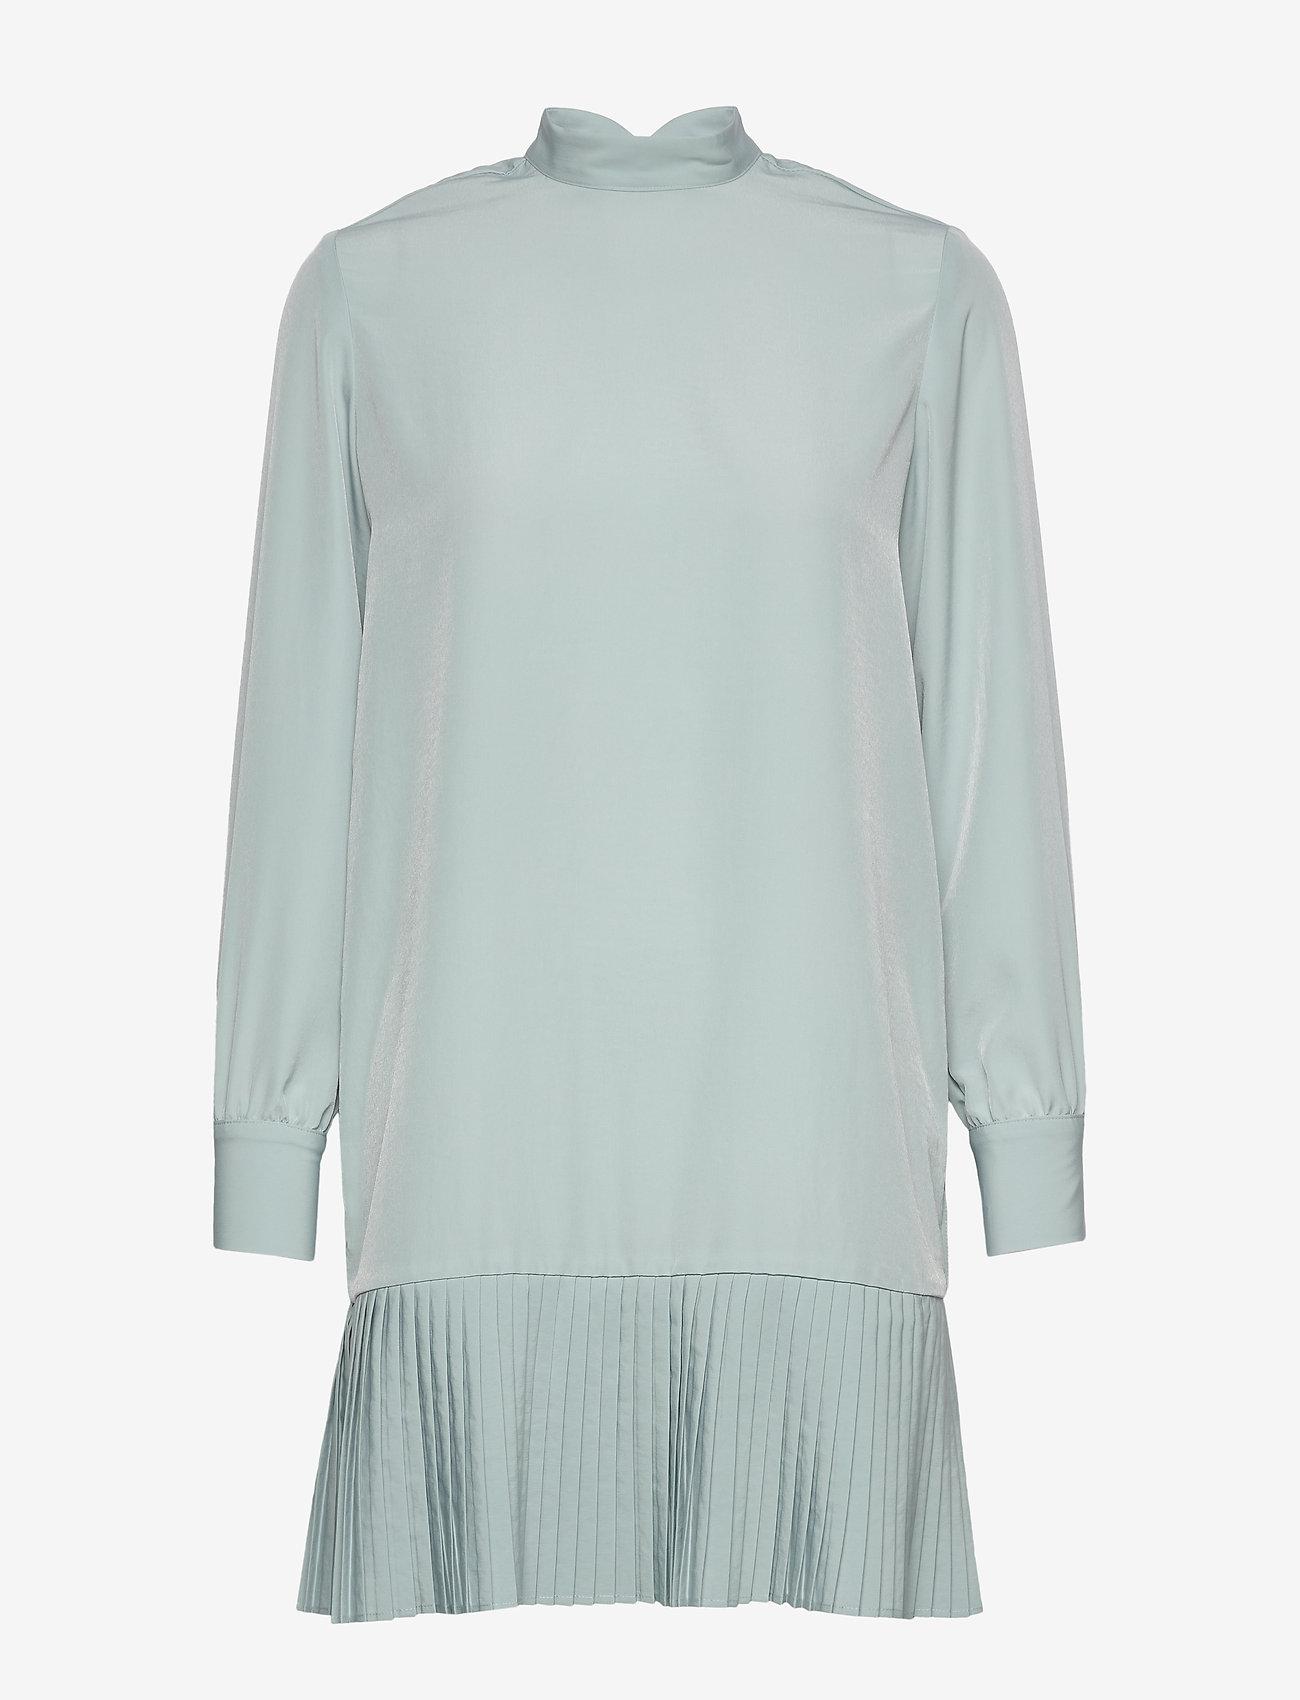 Kajo Shirt Dress (Foggy Blue) - hálo O6x4SM